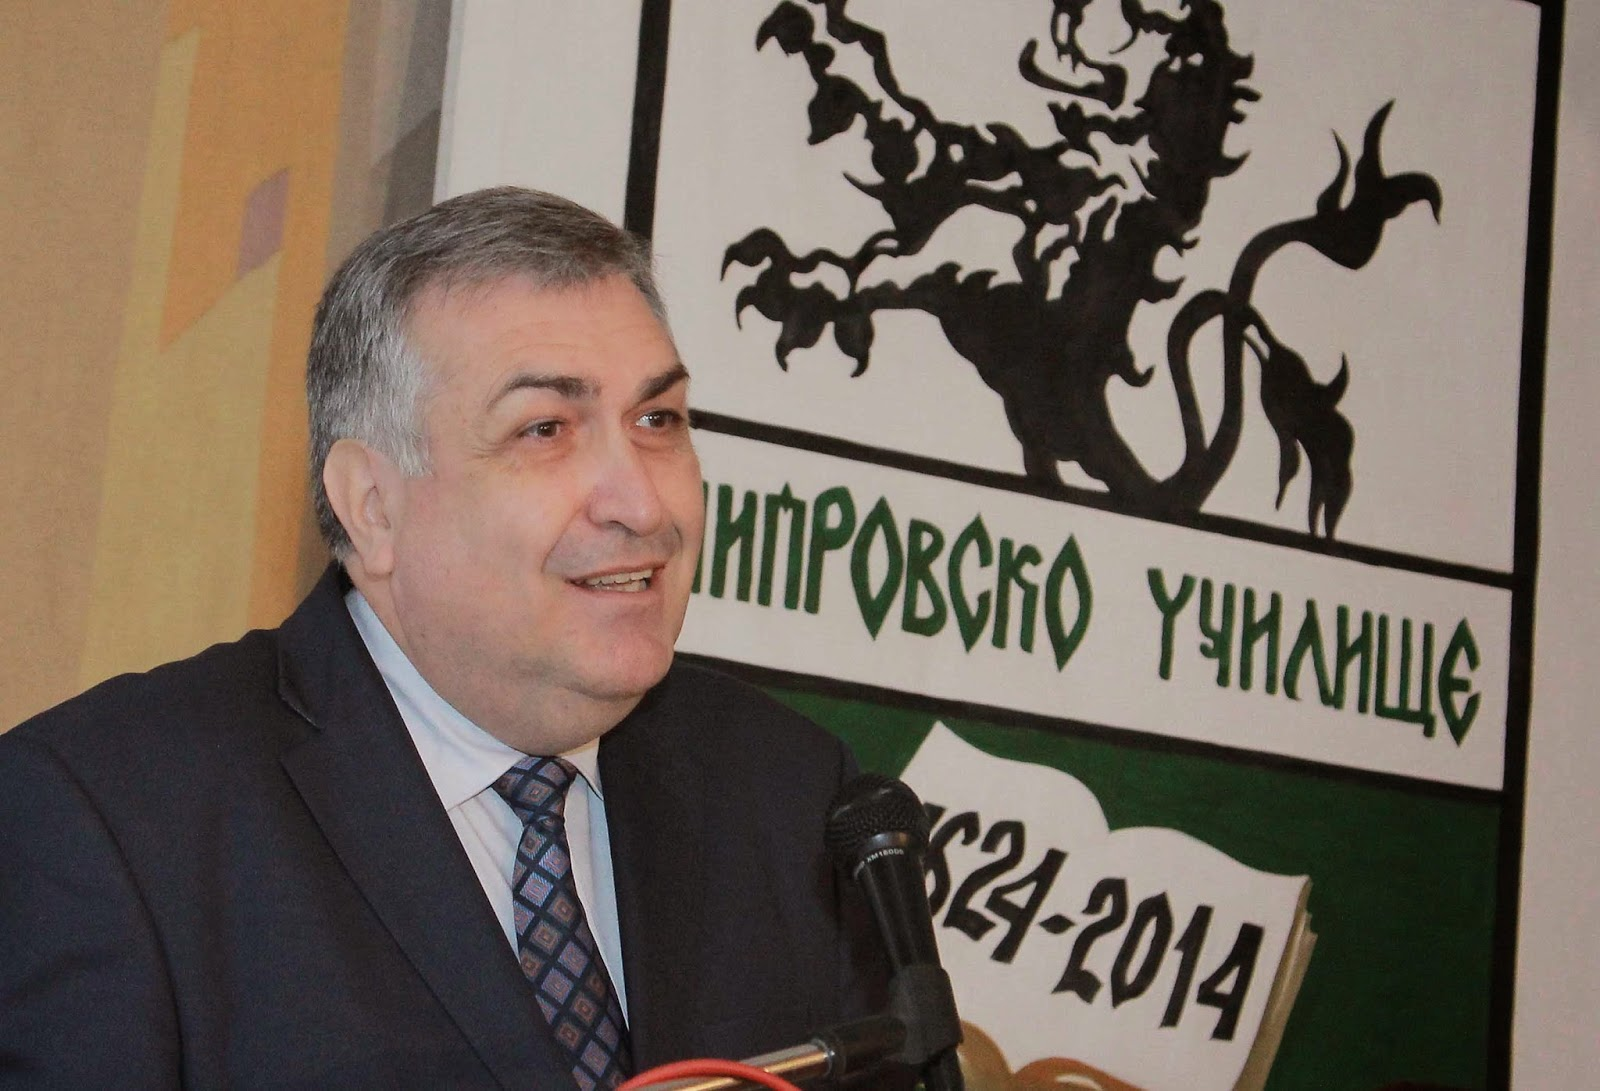 премиерът Георги Близнашки в Чипровци